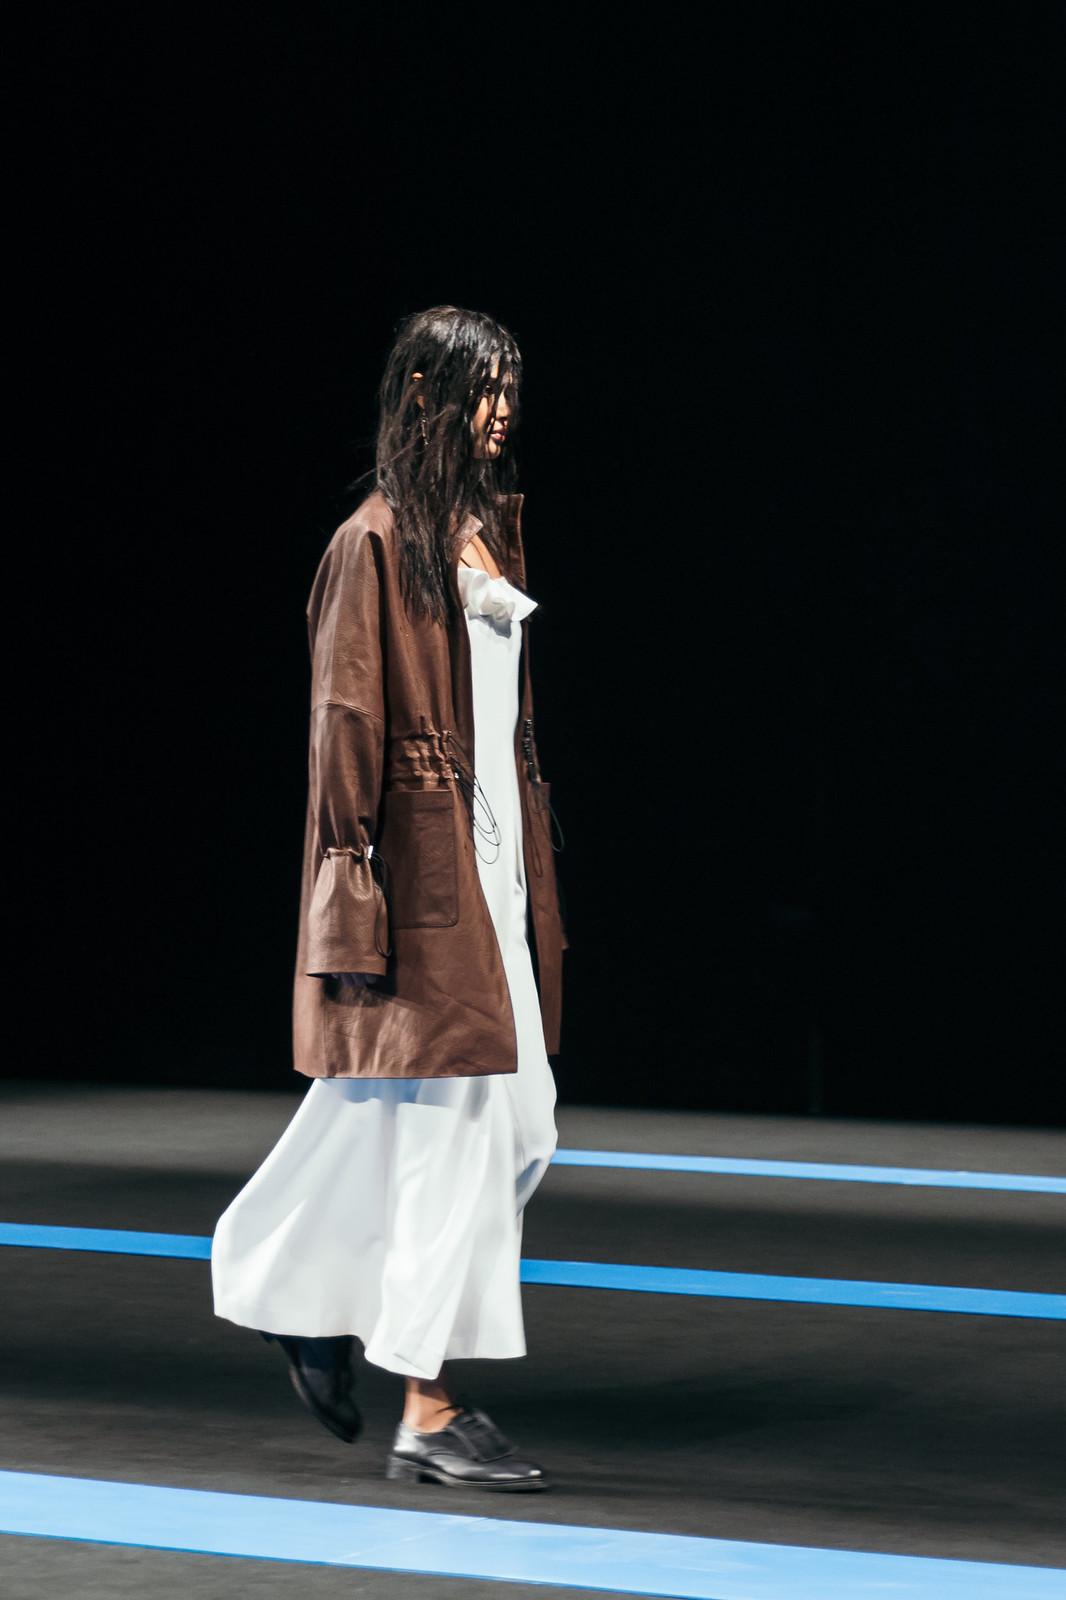 Jessie Chanes - Seams for a desire - 080 Bacelona Fashion #080bcnfasion -43